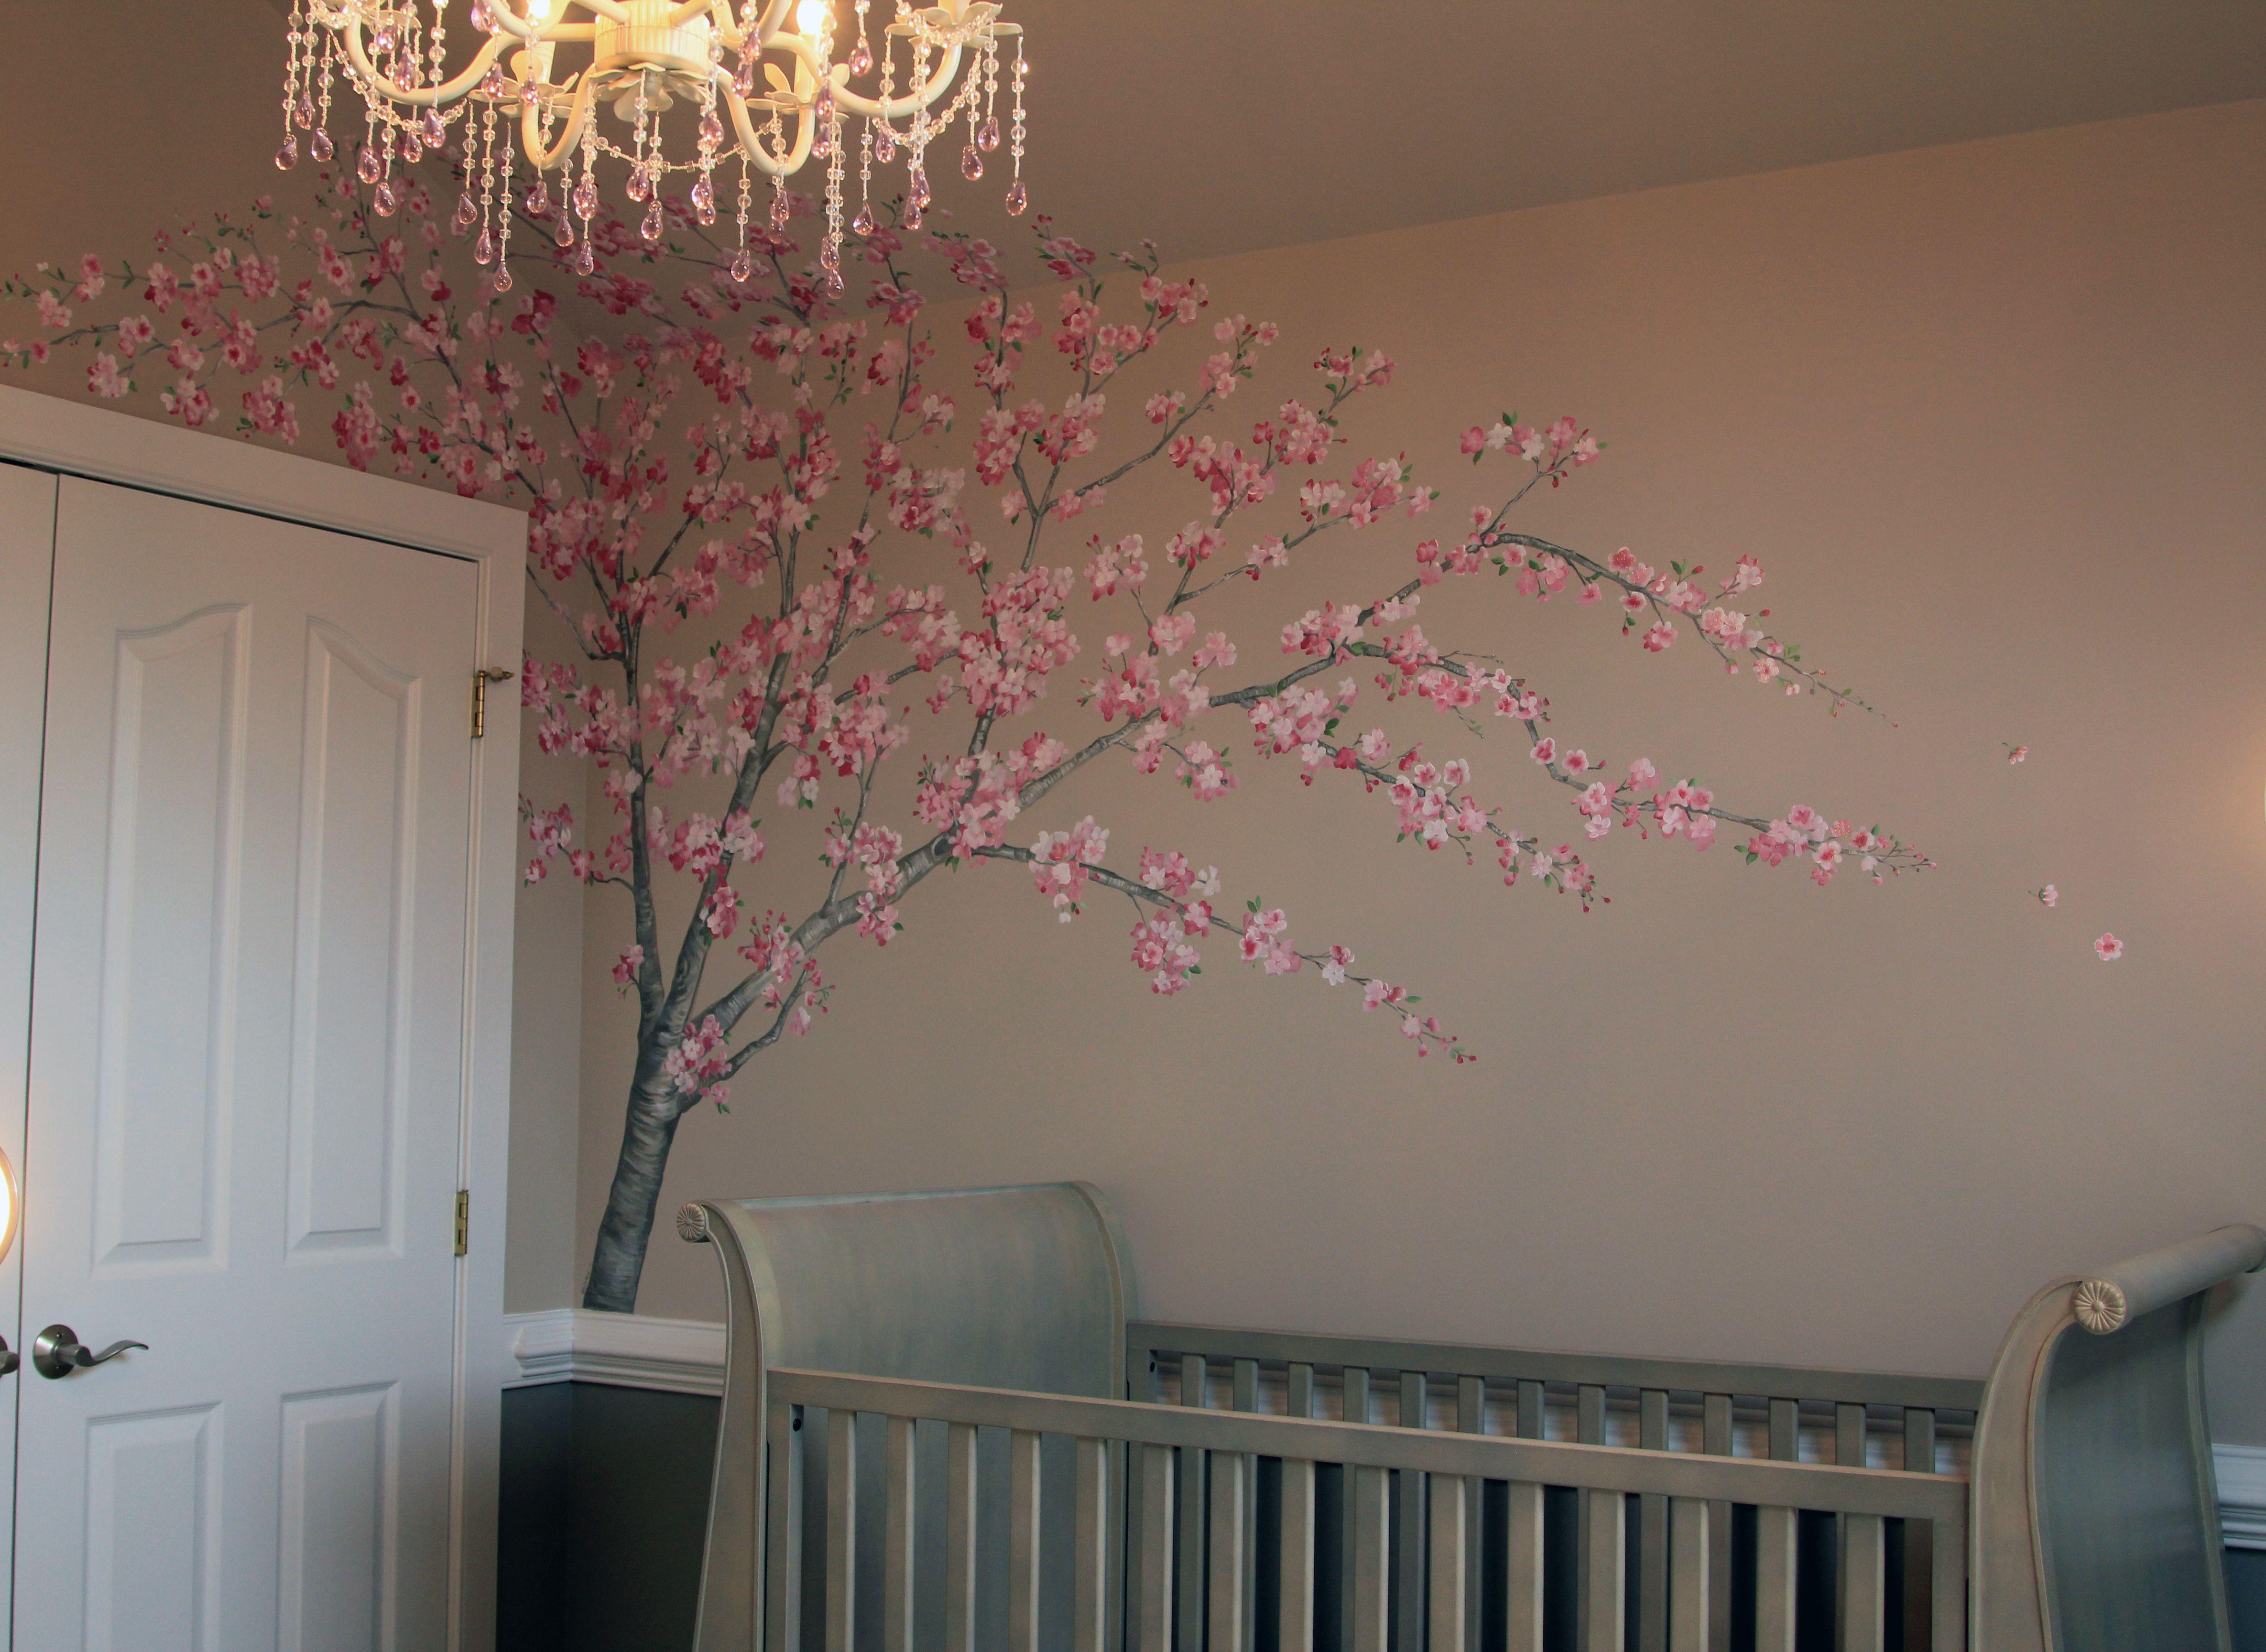 Crib Restoration Hardware In French Gray Cherry Blossom Nursery Nursery Inspiration Nursery Decor